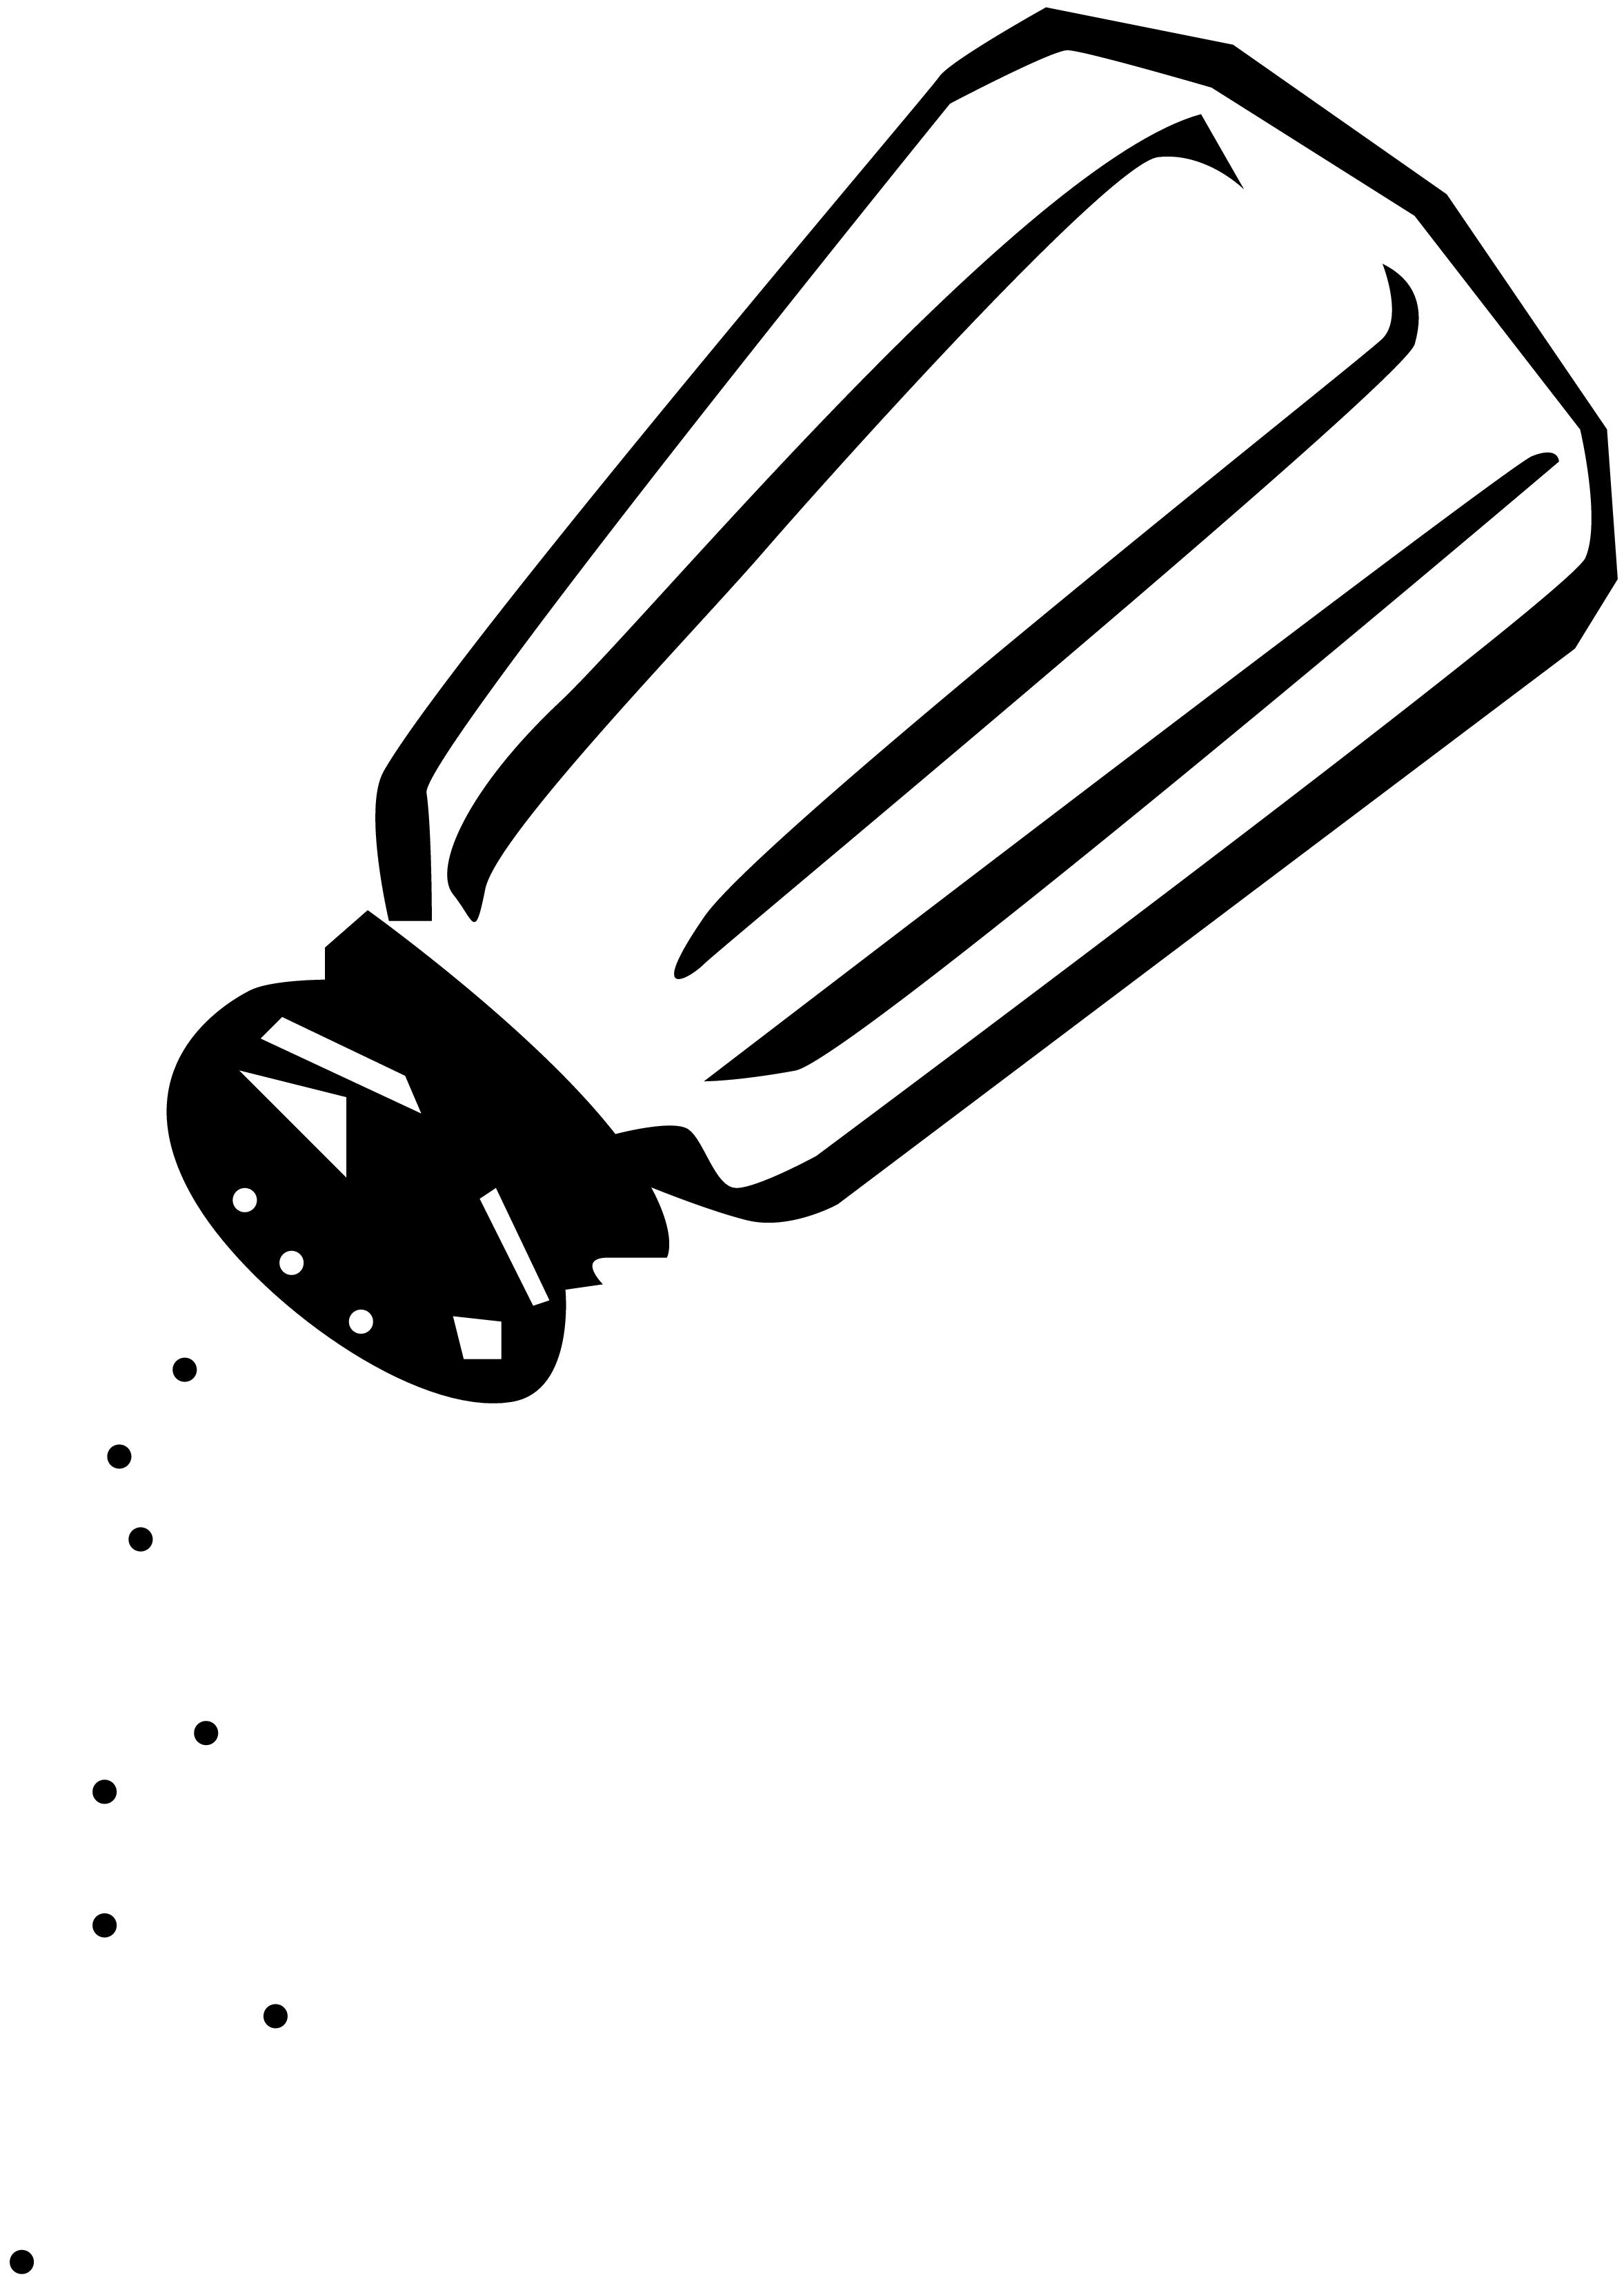 Saltshaker clipart png Free Salt Cliparts, Download Free Clip Art, Free Clip Art on ... png